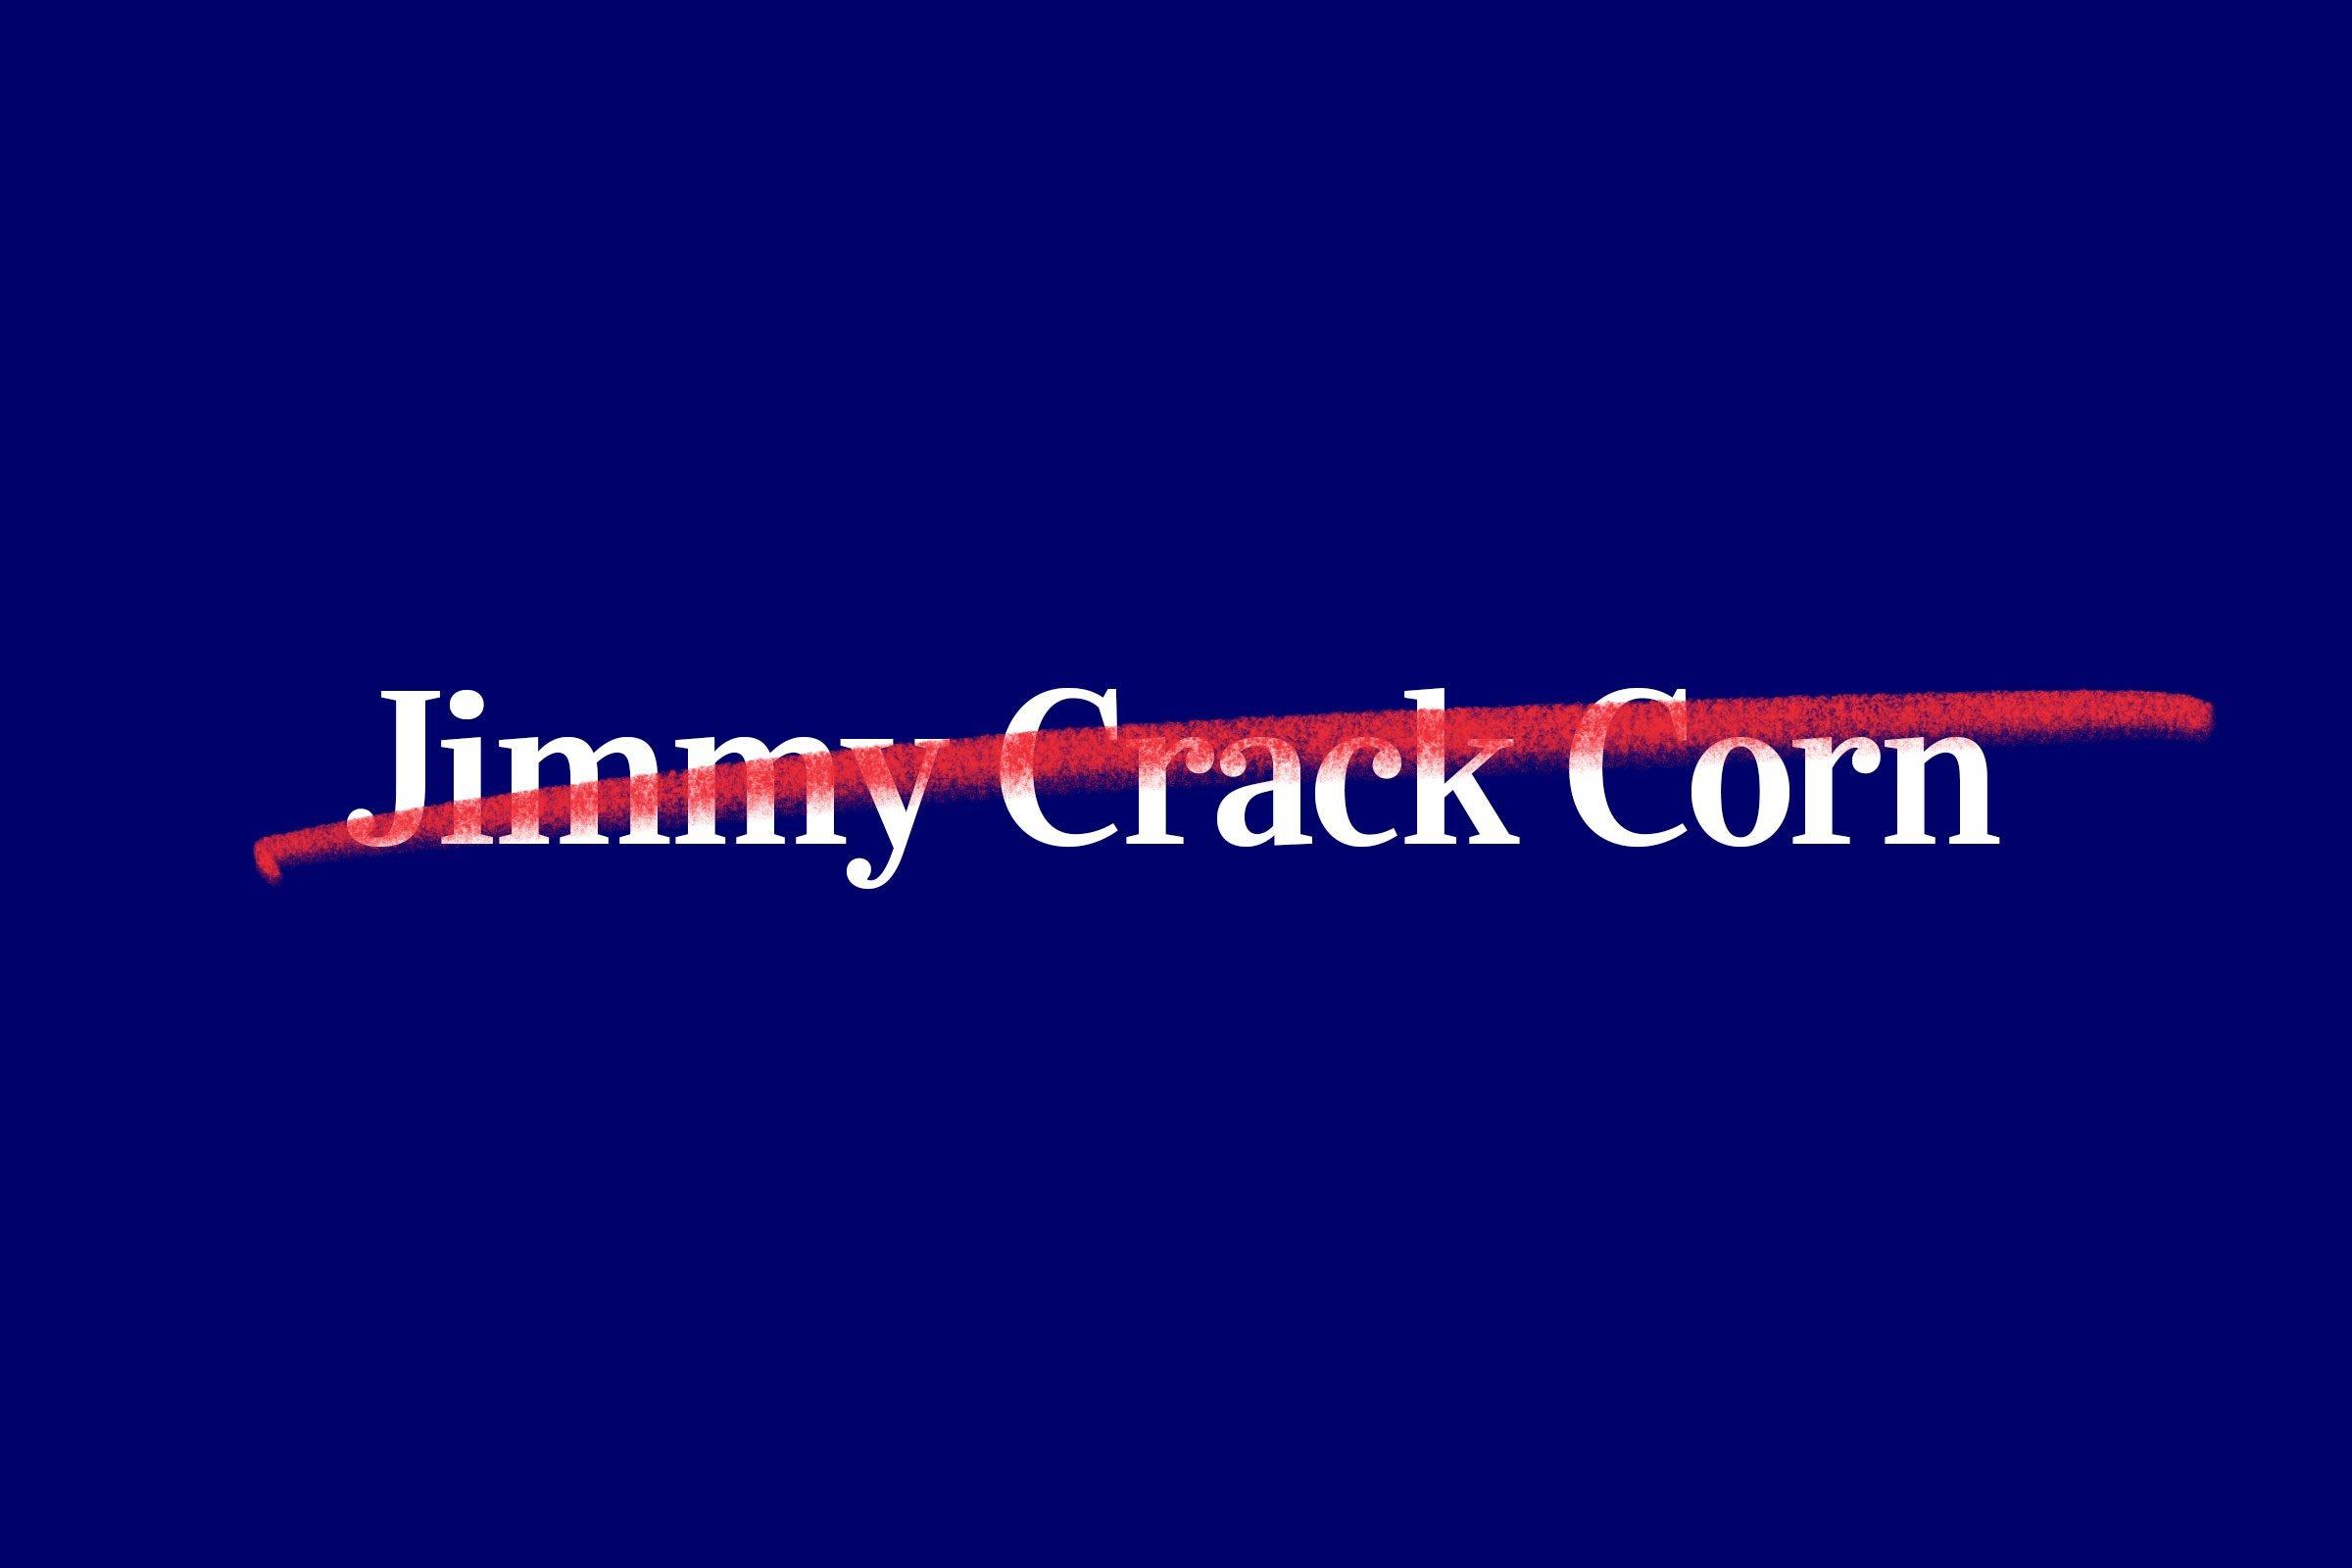 nursery rhyme title (Jimmy Crack Corn) with red strikethrough overlay